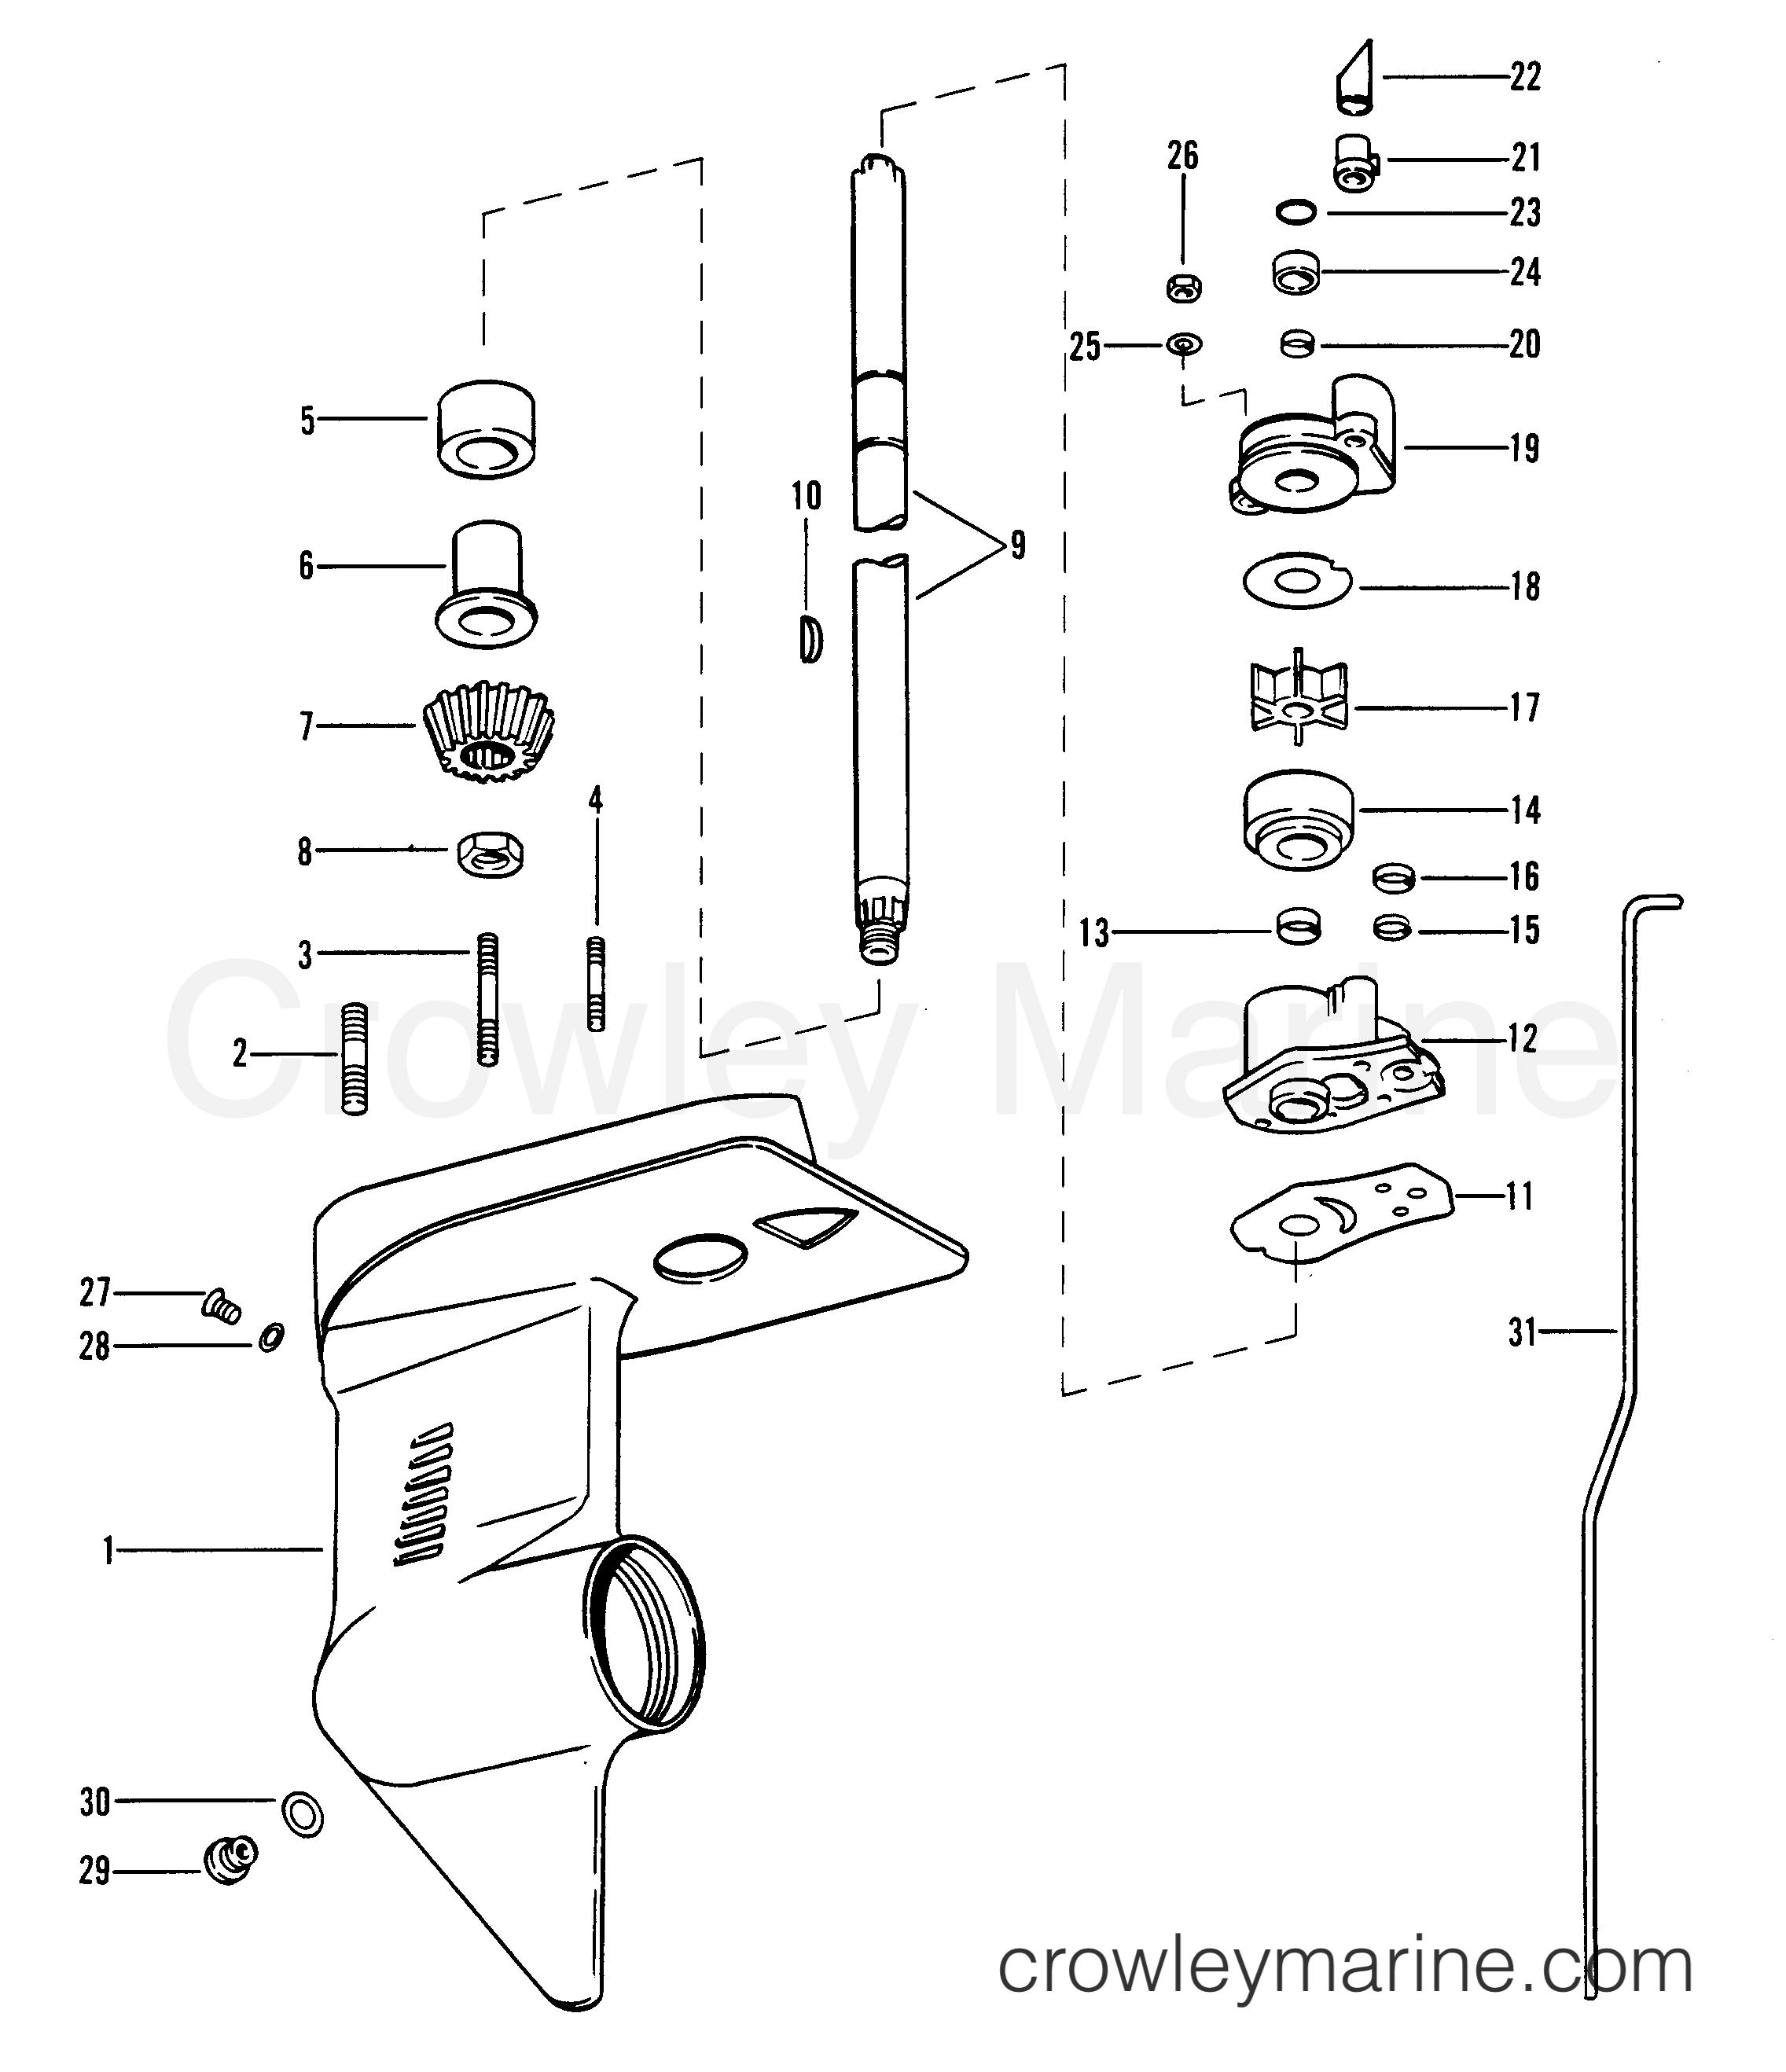 ремонт редуктора на лодочном моторе меркури